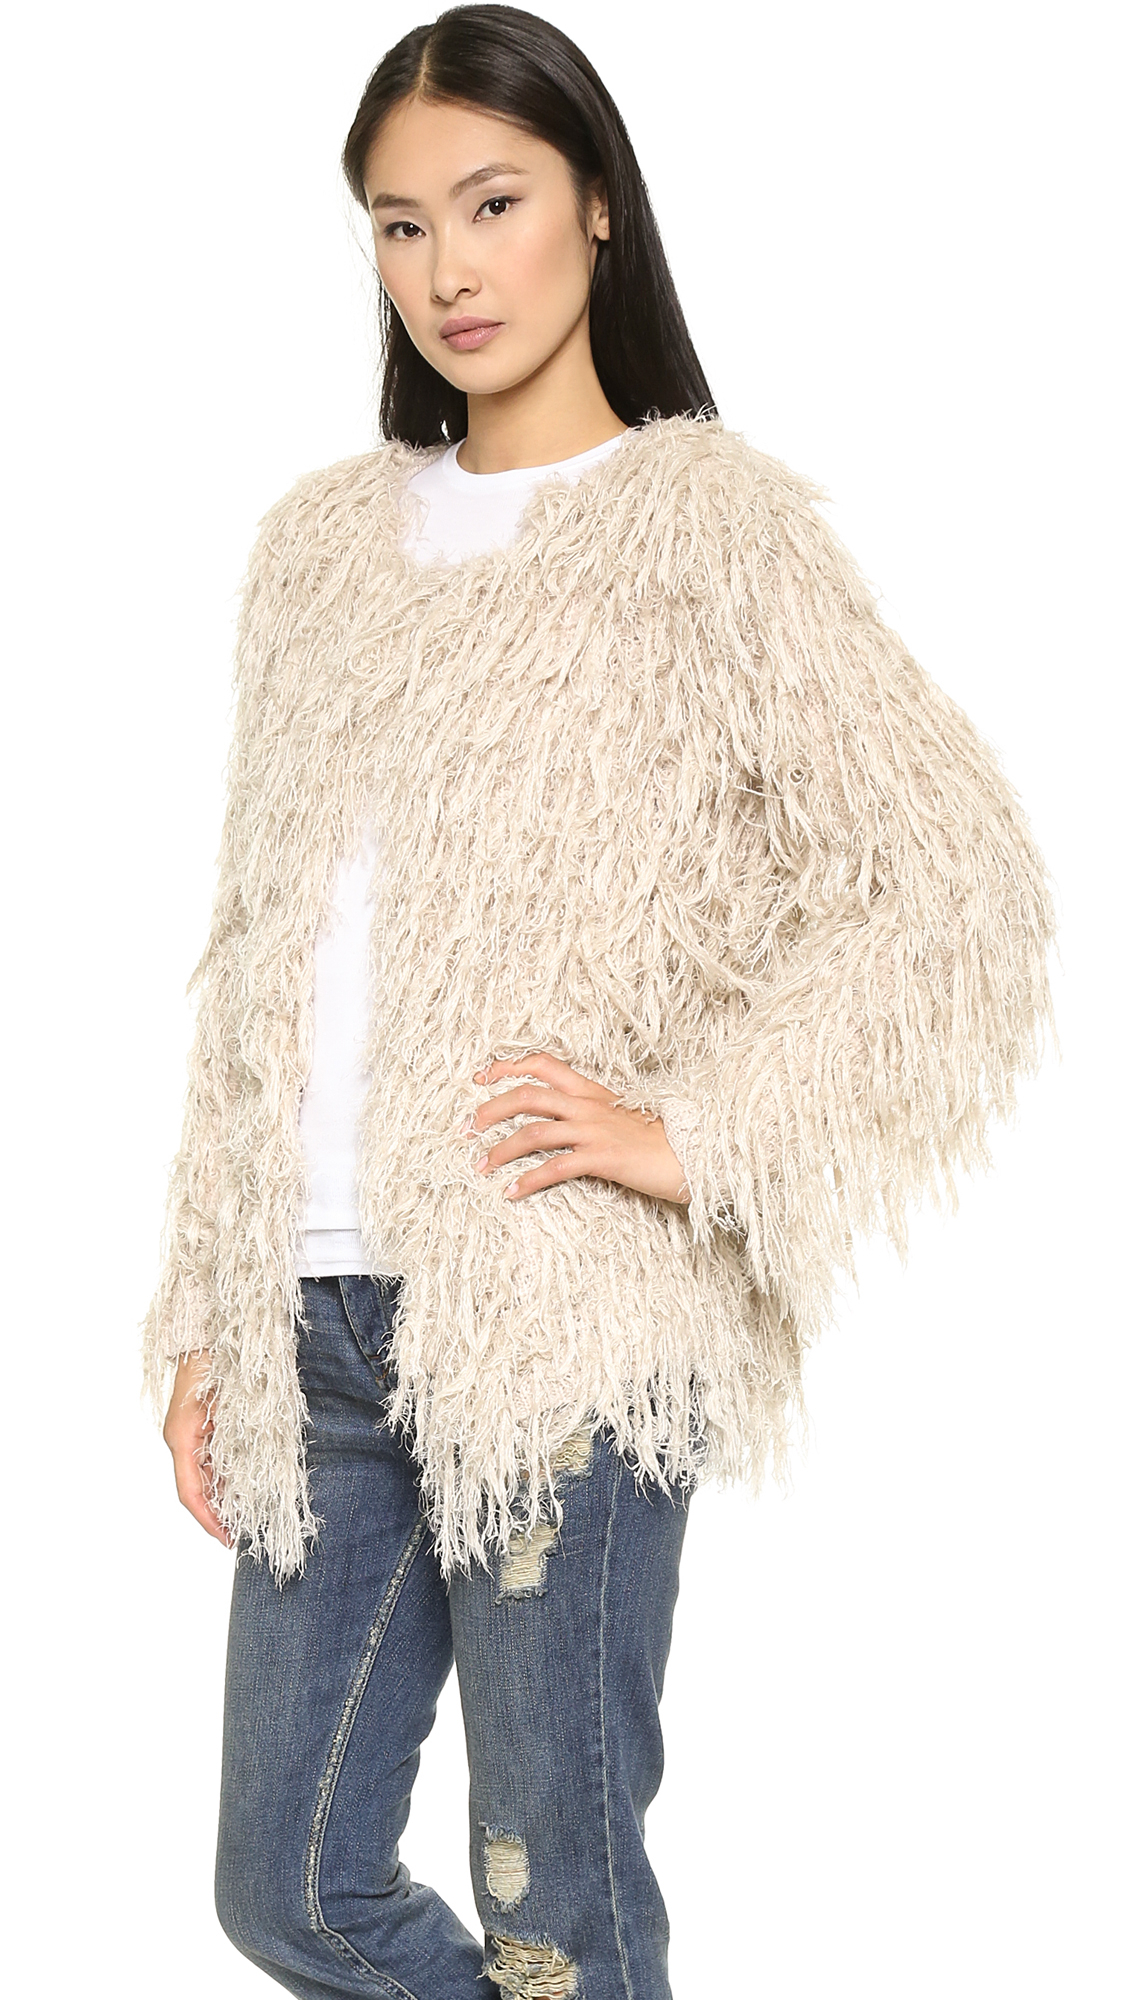 Patagonia Womens Better Sweater | Adidas Sweater Womens | Shaggy Sweater